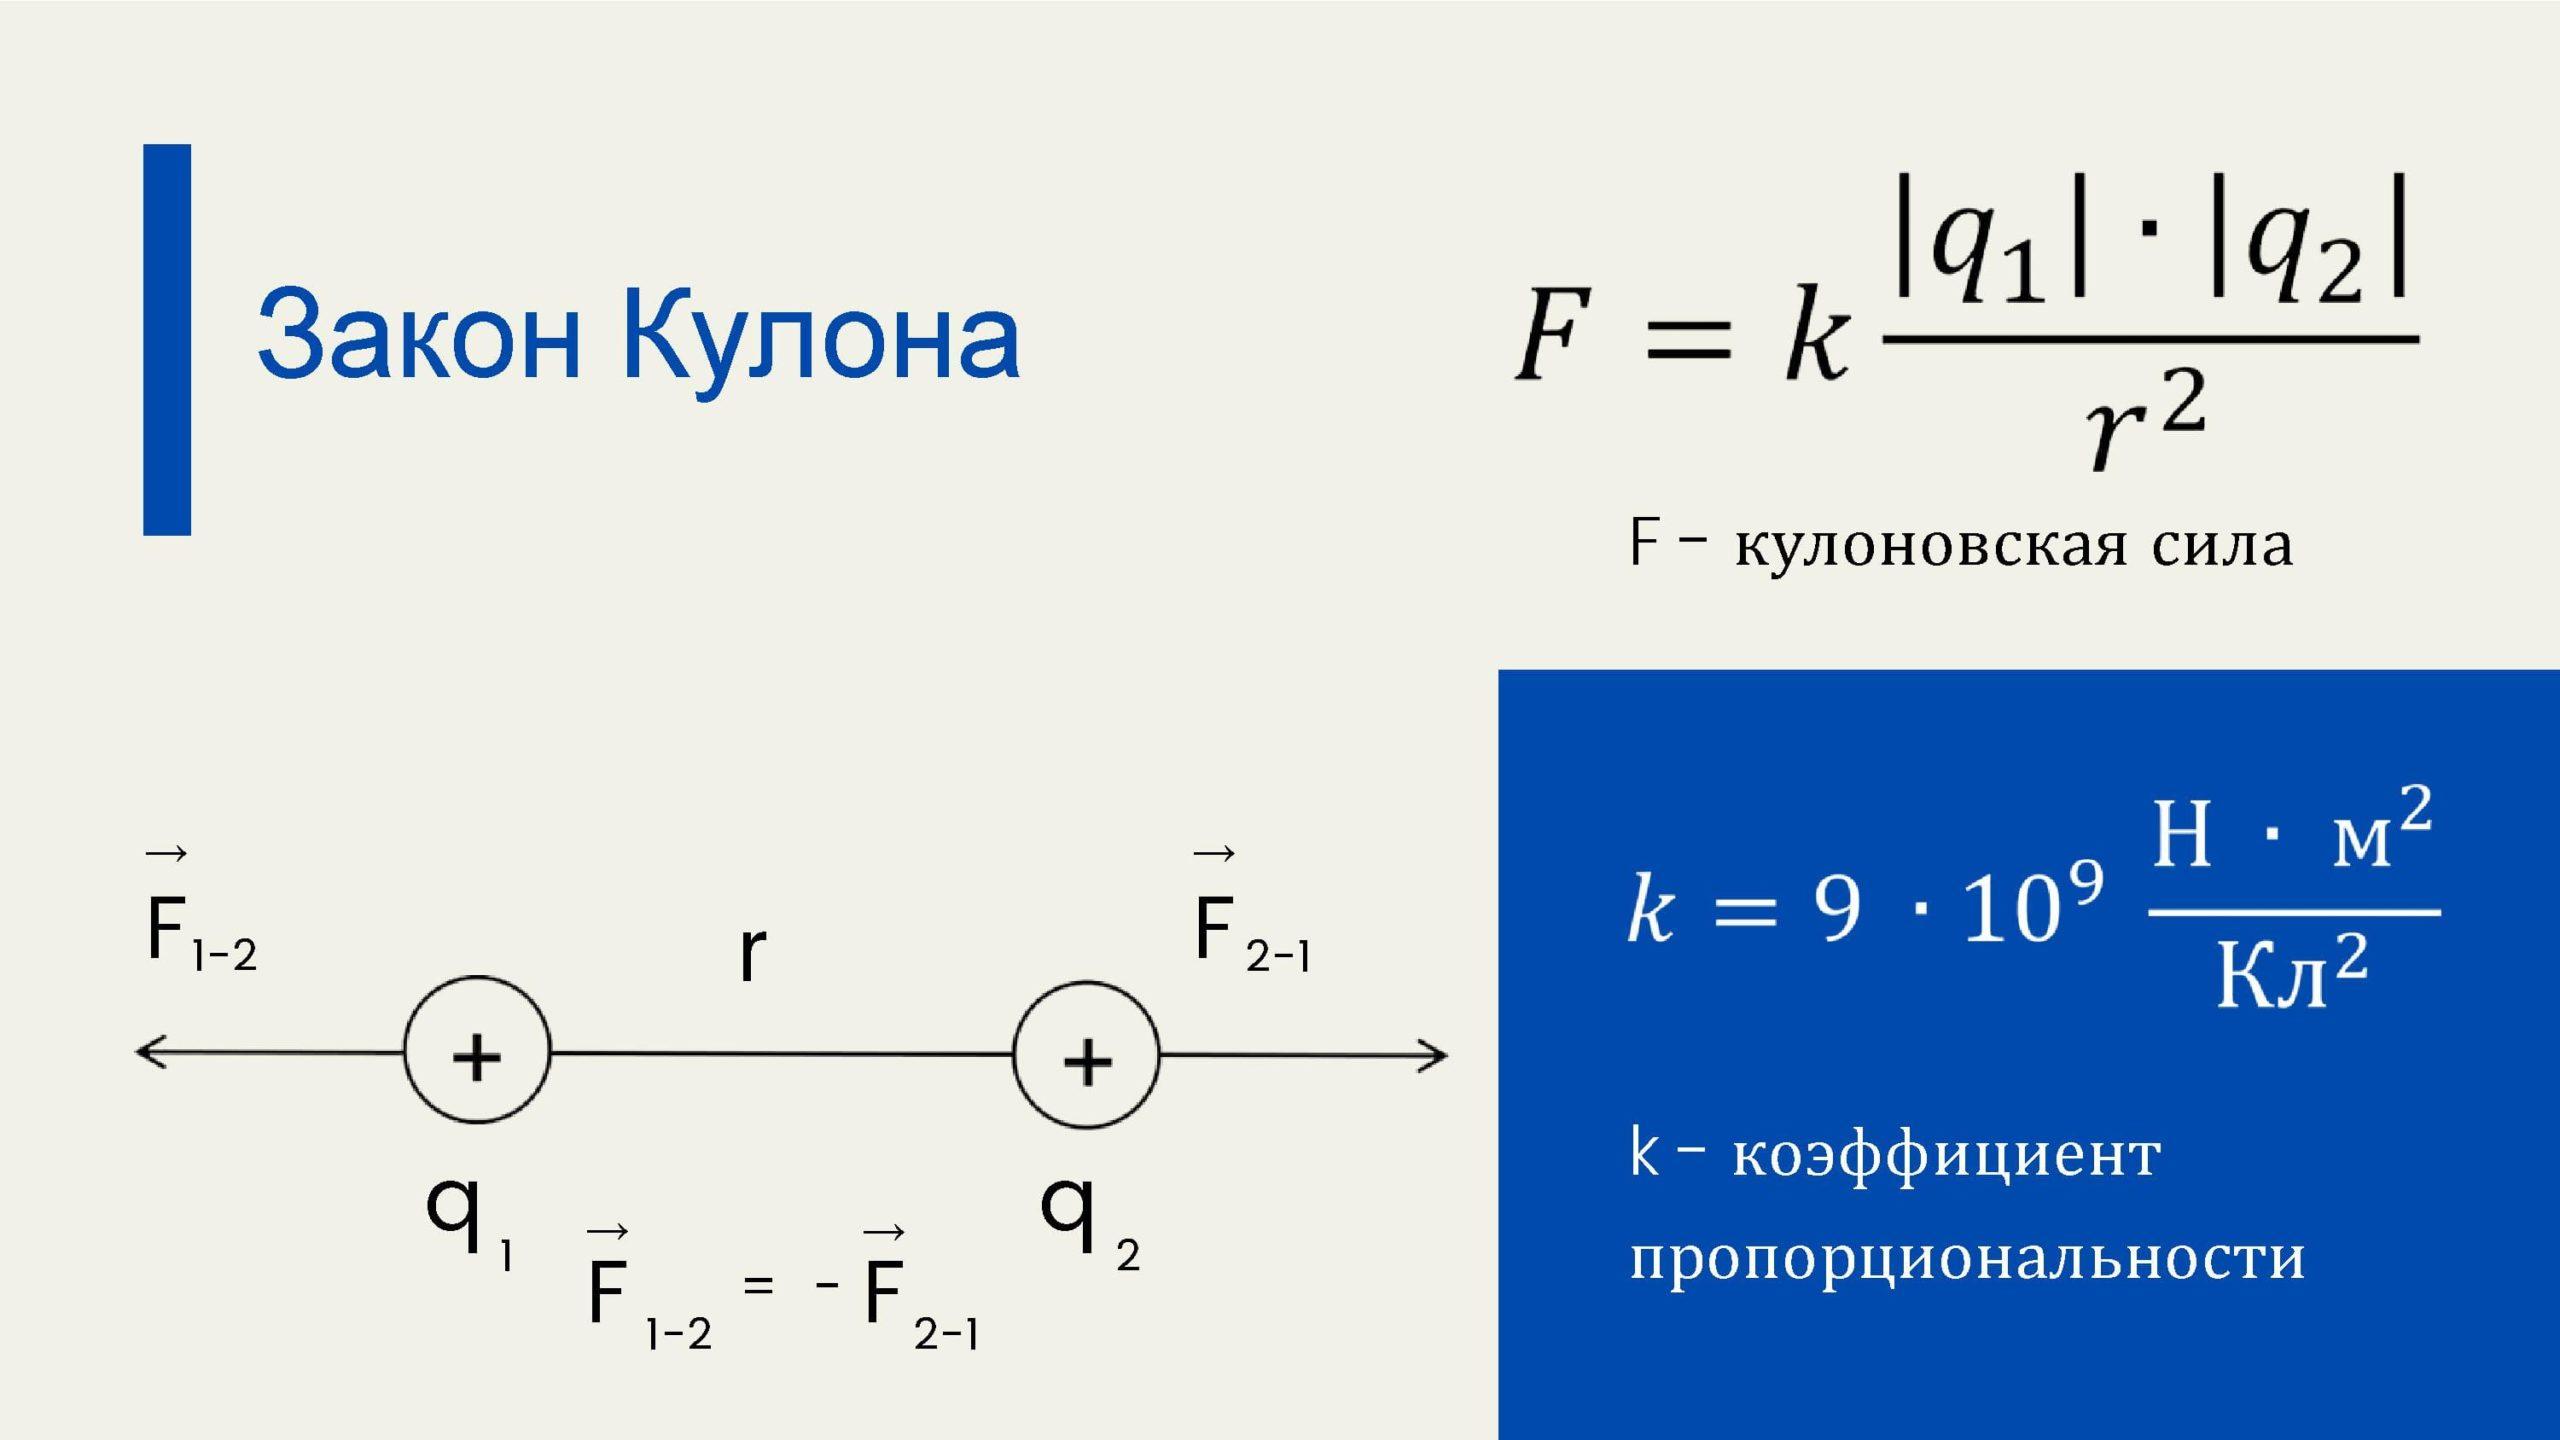 Закон Кулона. Формулы. Кулоновская сила